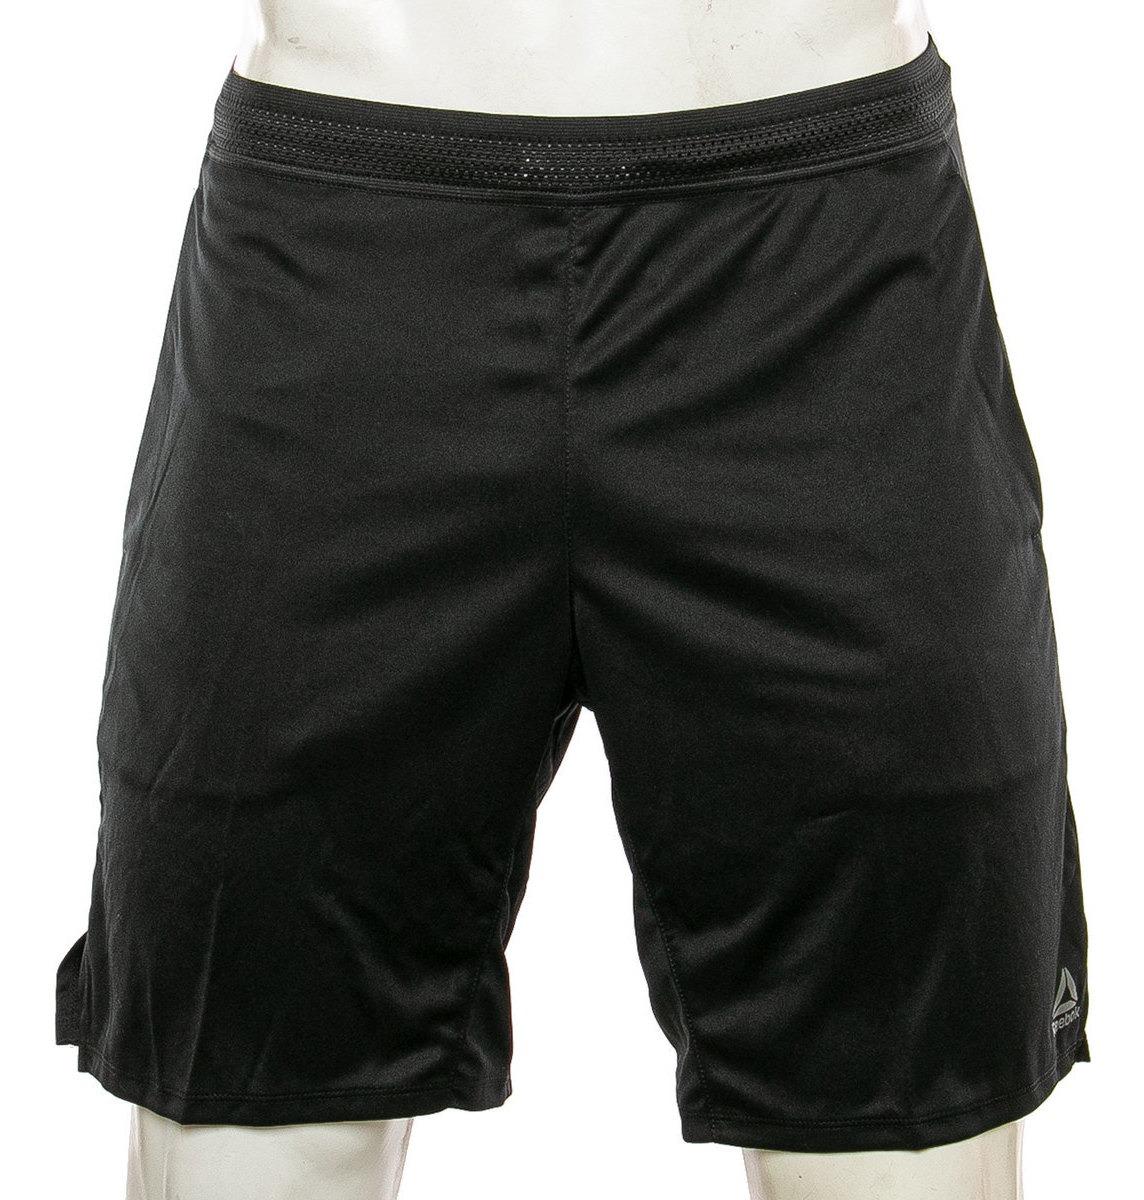 Short One Series Knit Reebok